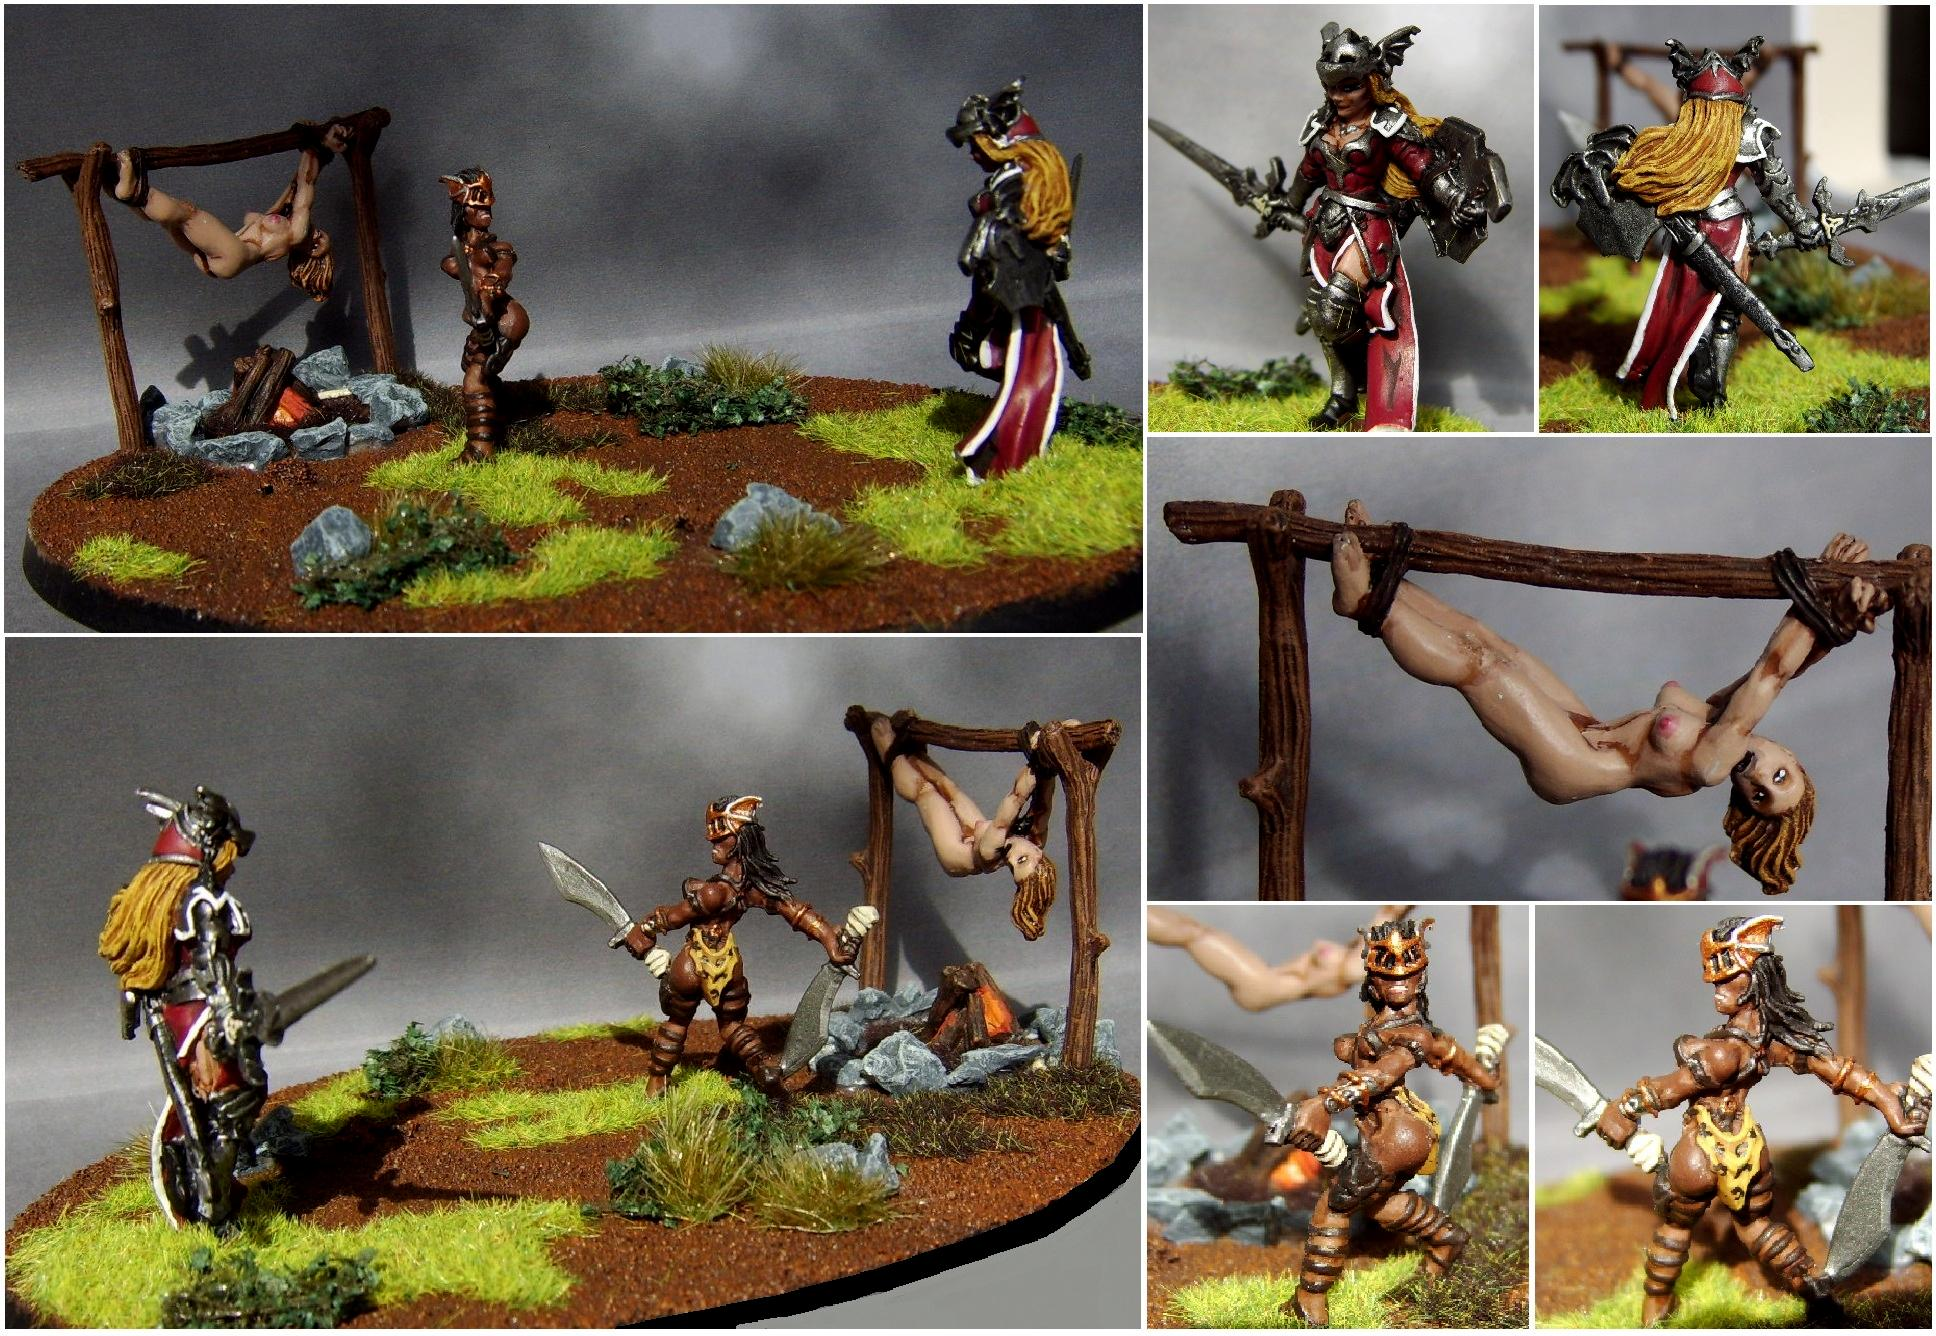 Captive, Diorama, Elves, Female, Nsfw, Reaper, Reaper Miniatures, Scenic, Sexy